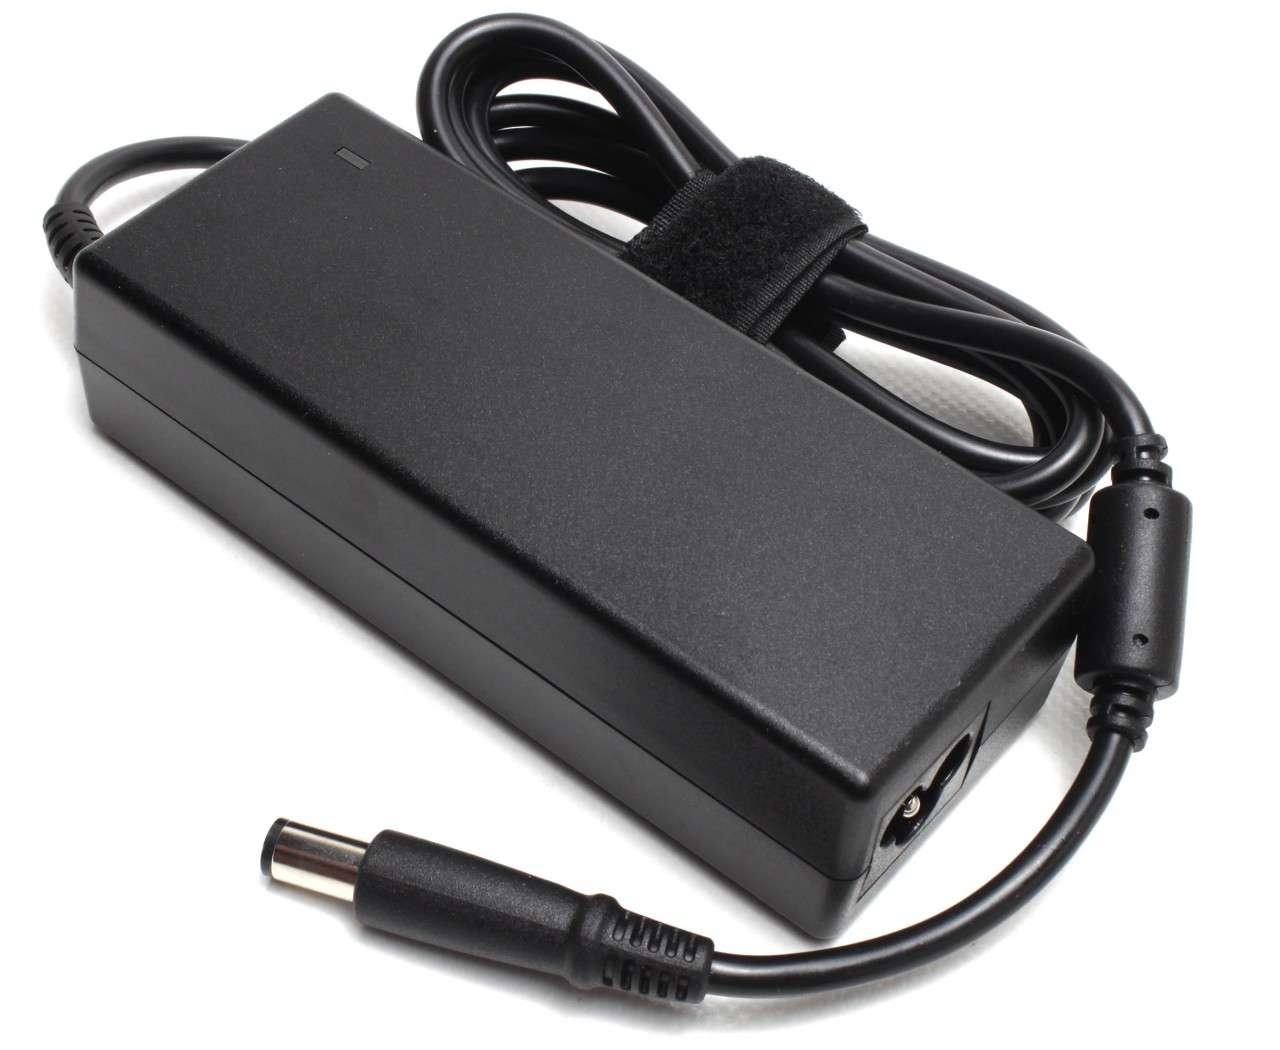 Incarcator Dell Latitude E7470 VARIANTA 3 imagine powerlaptop.ro 2021